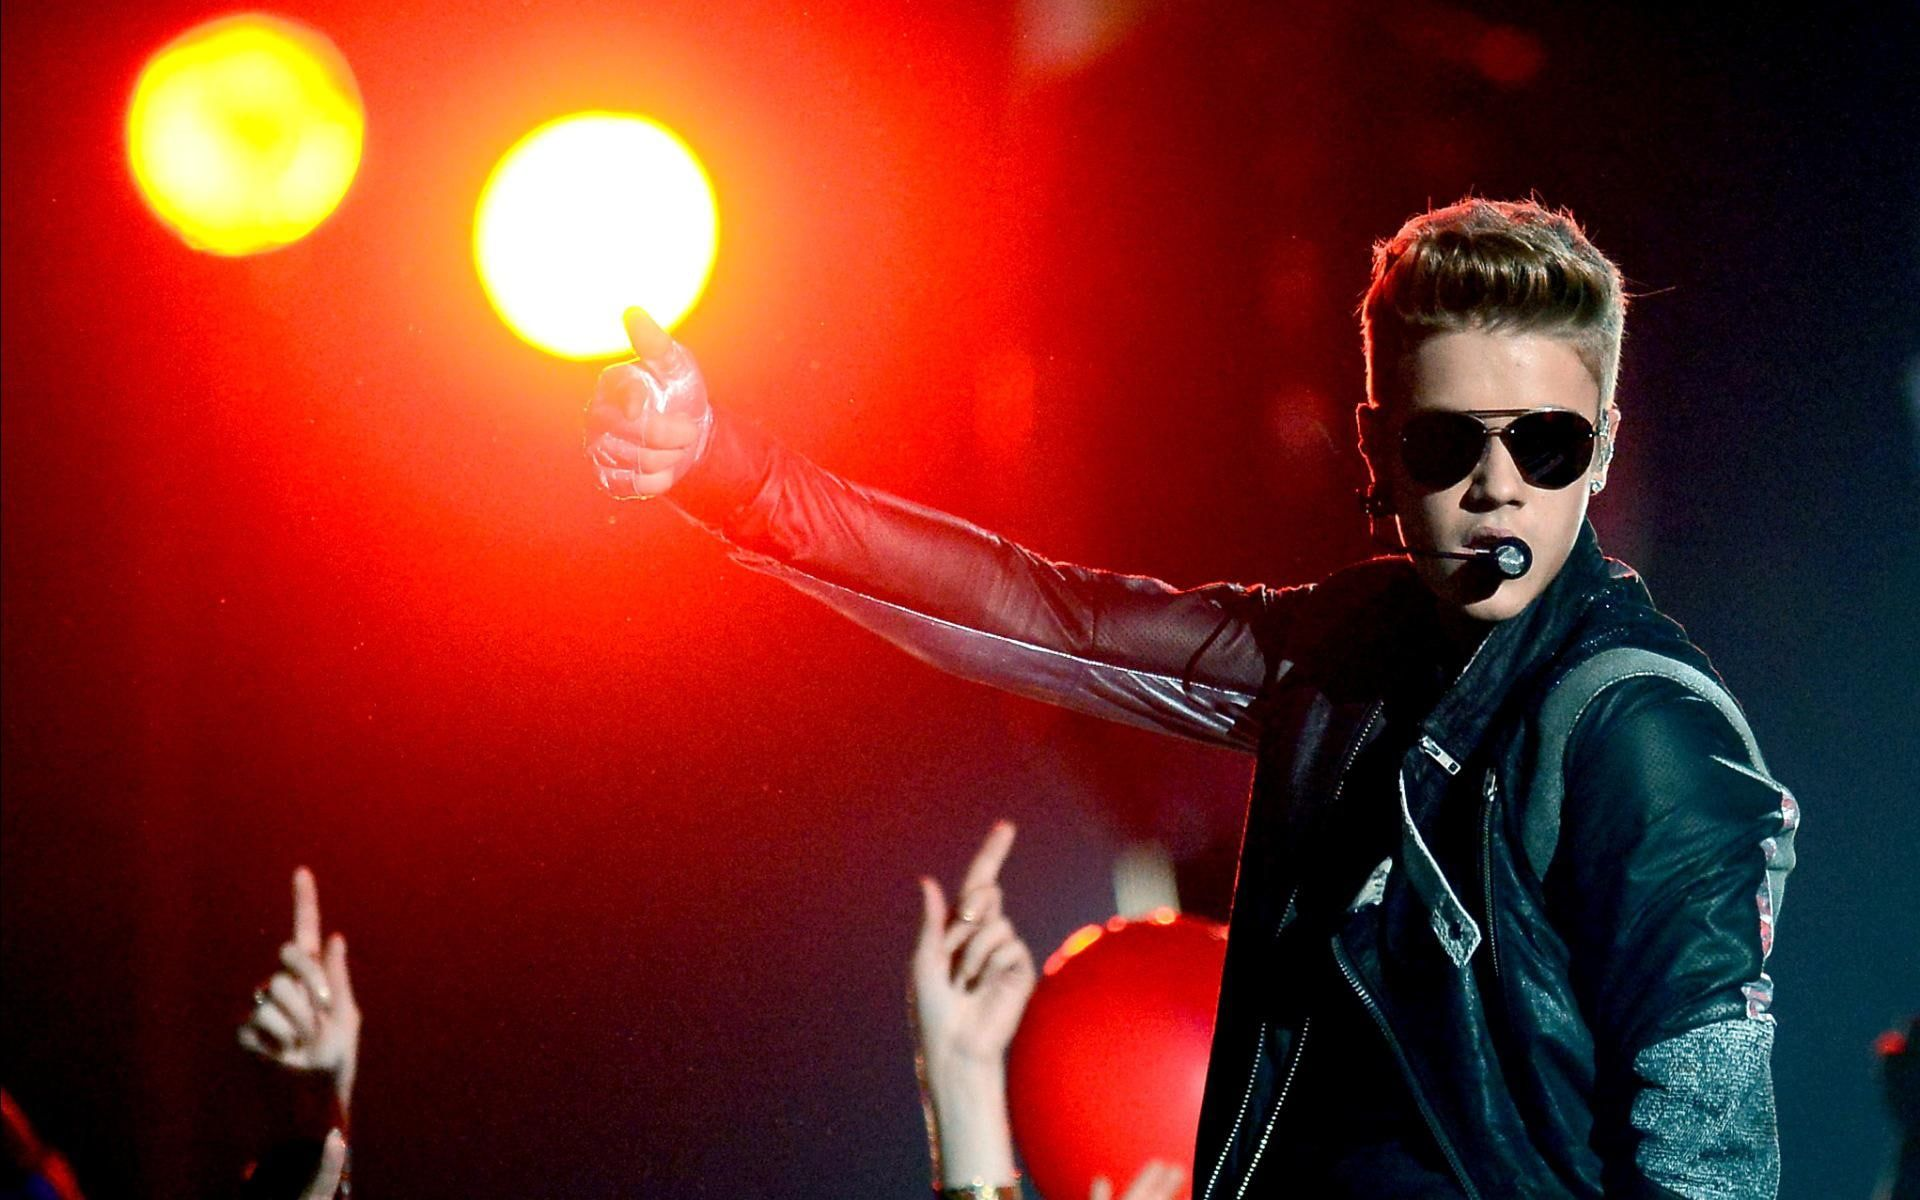 Justin Bieber On Stage Justin Bieber Celebrity Celebrities Actress Single Boys 1080p W In 2020 Justin Bieber Pictures Justin Bieber Wallpaper Justin Bieber News